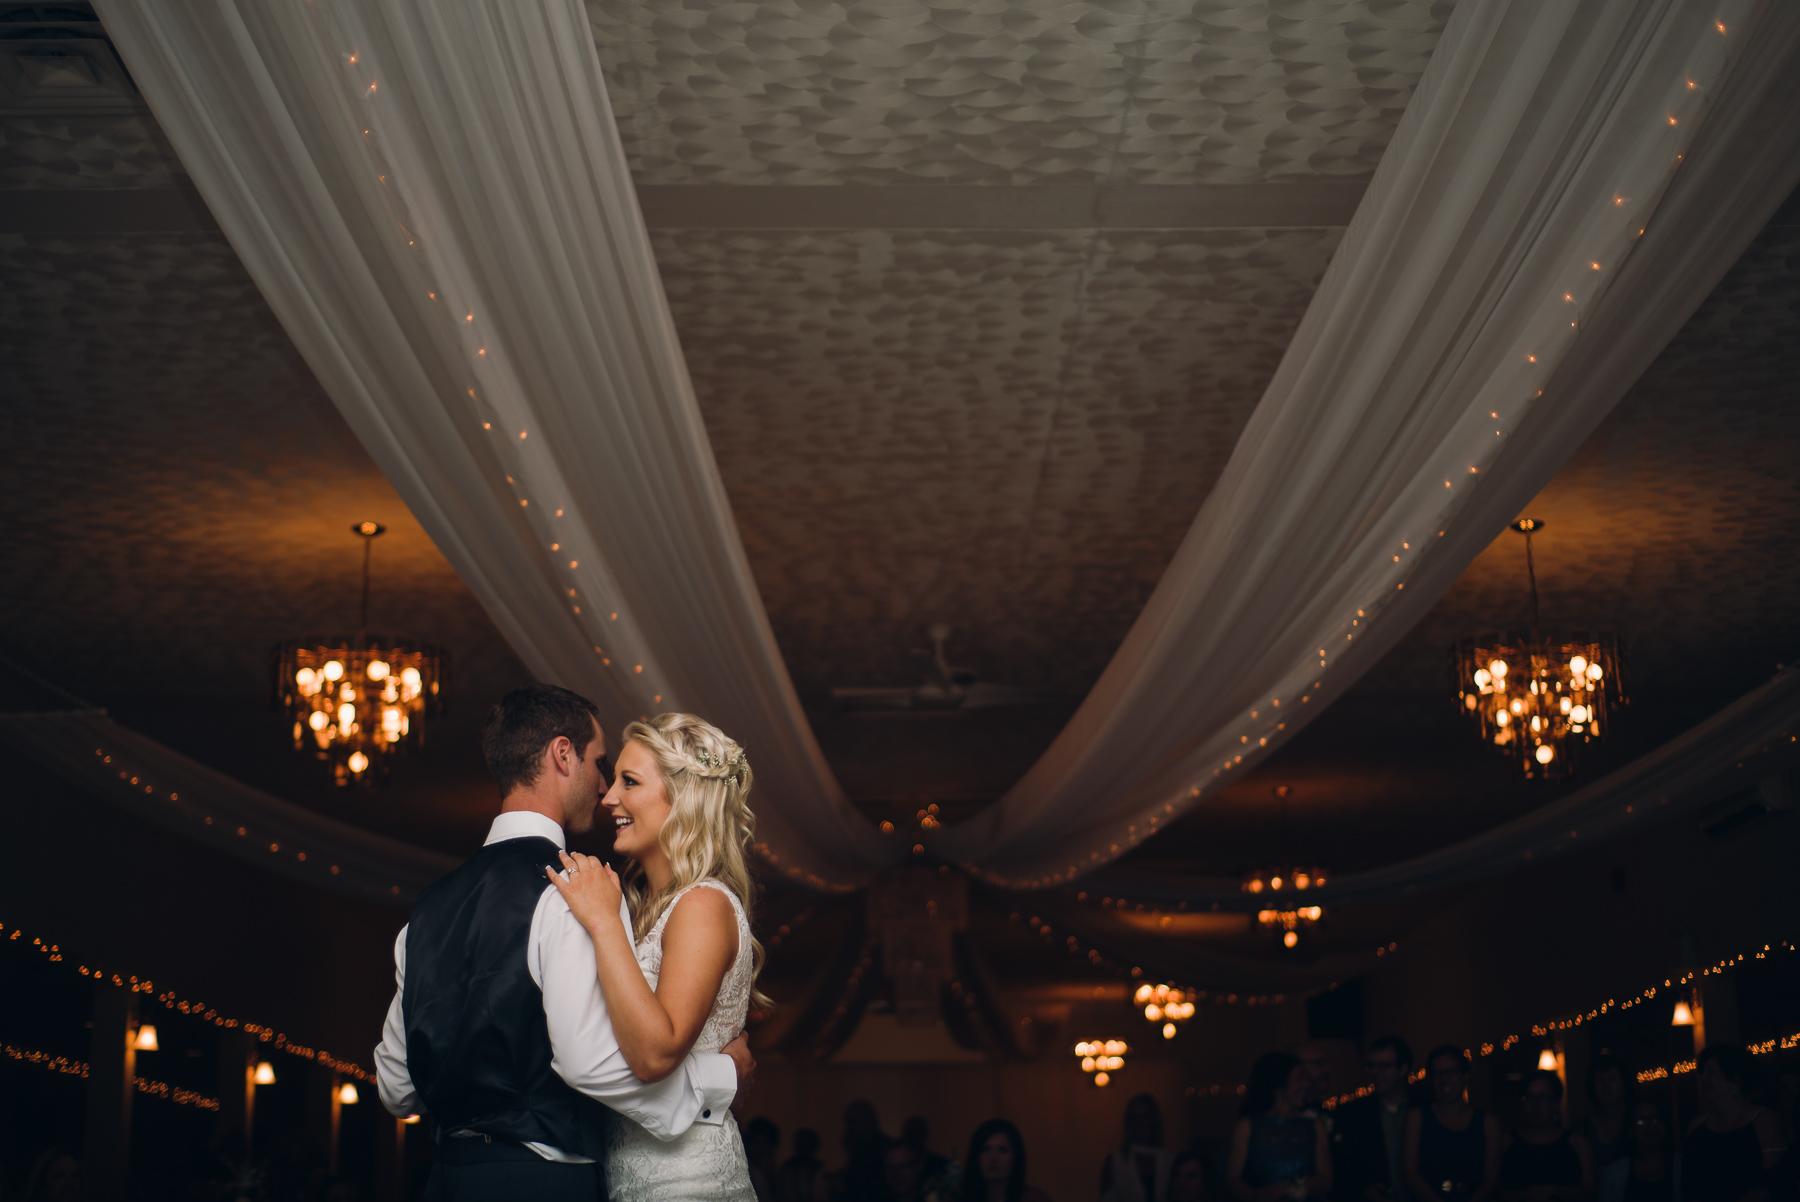 Kingston Wedding_Alabaster Jar Photography (40 of 42).jpg